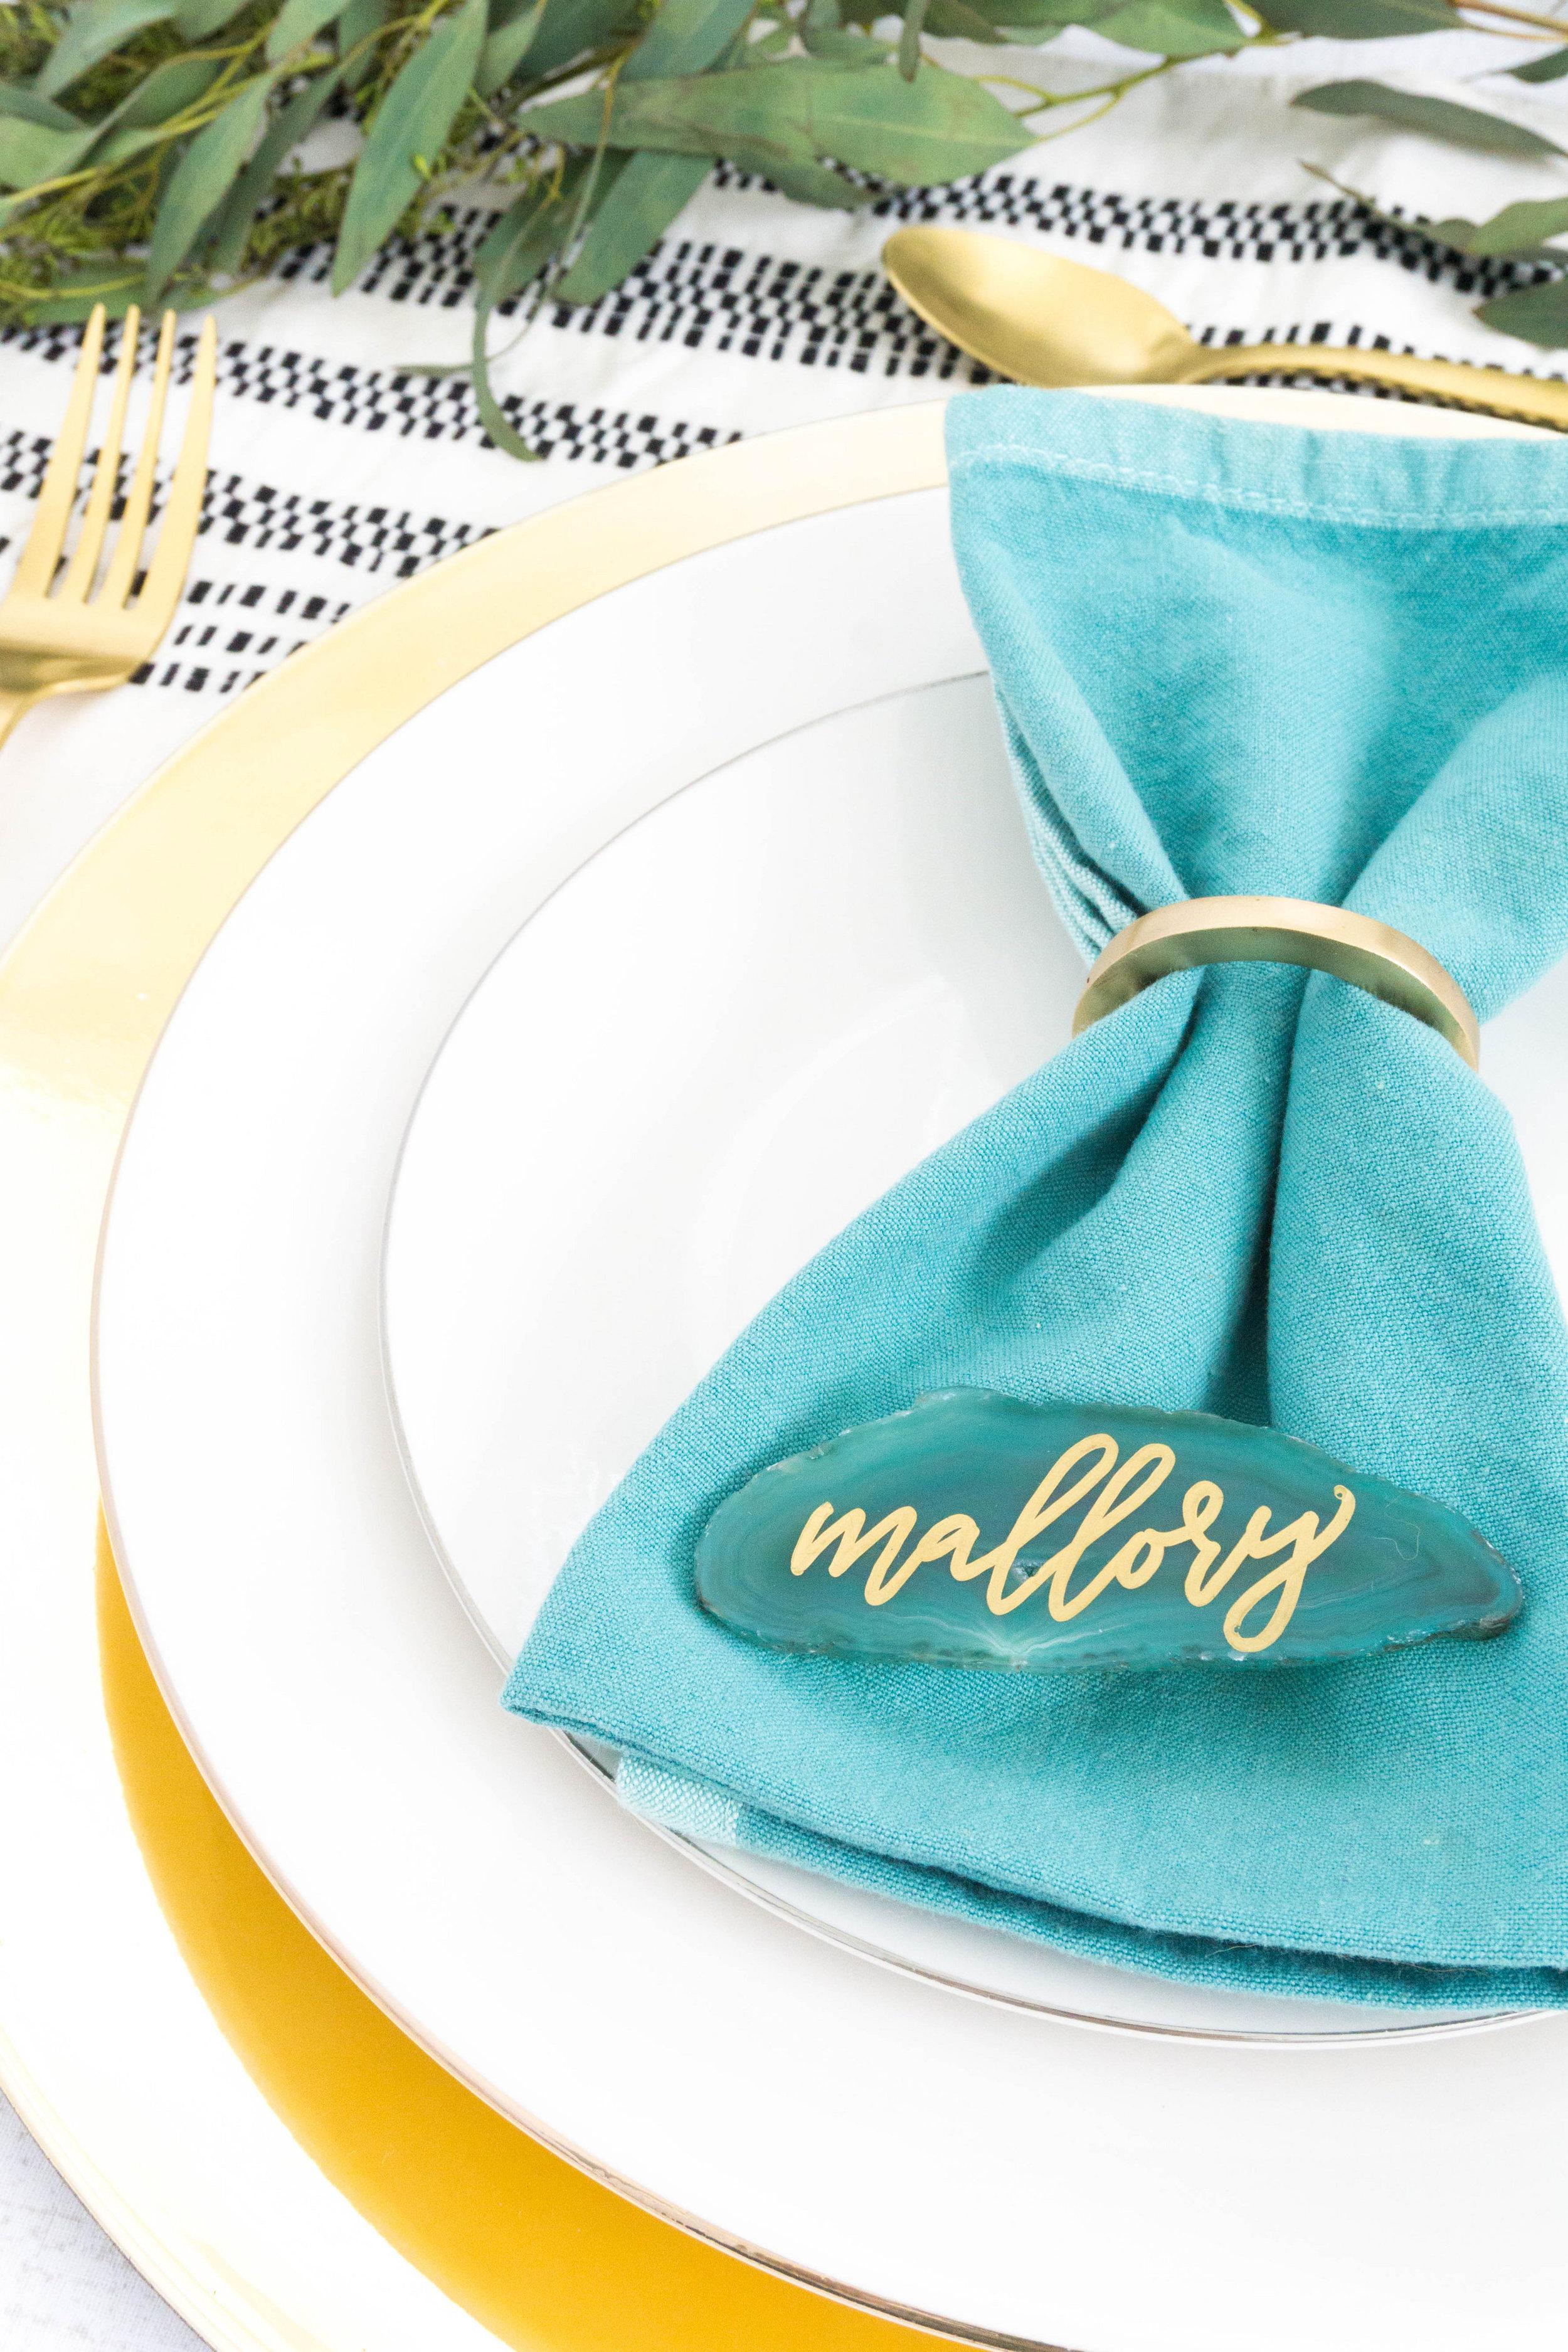 love-fern-design-studio-custom-wedding-invitations-for-the-modern-couple-modern-calligraphy-in-seattle-washington-custom-wedding-stationery-navy-gold-teal-agate-slice-place-card-geode-wedding